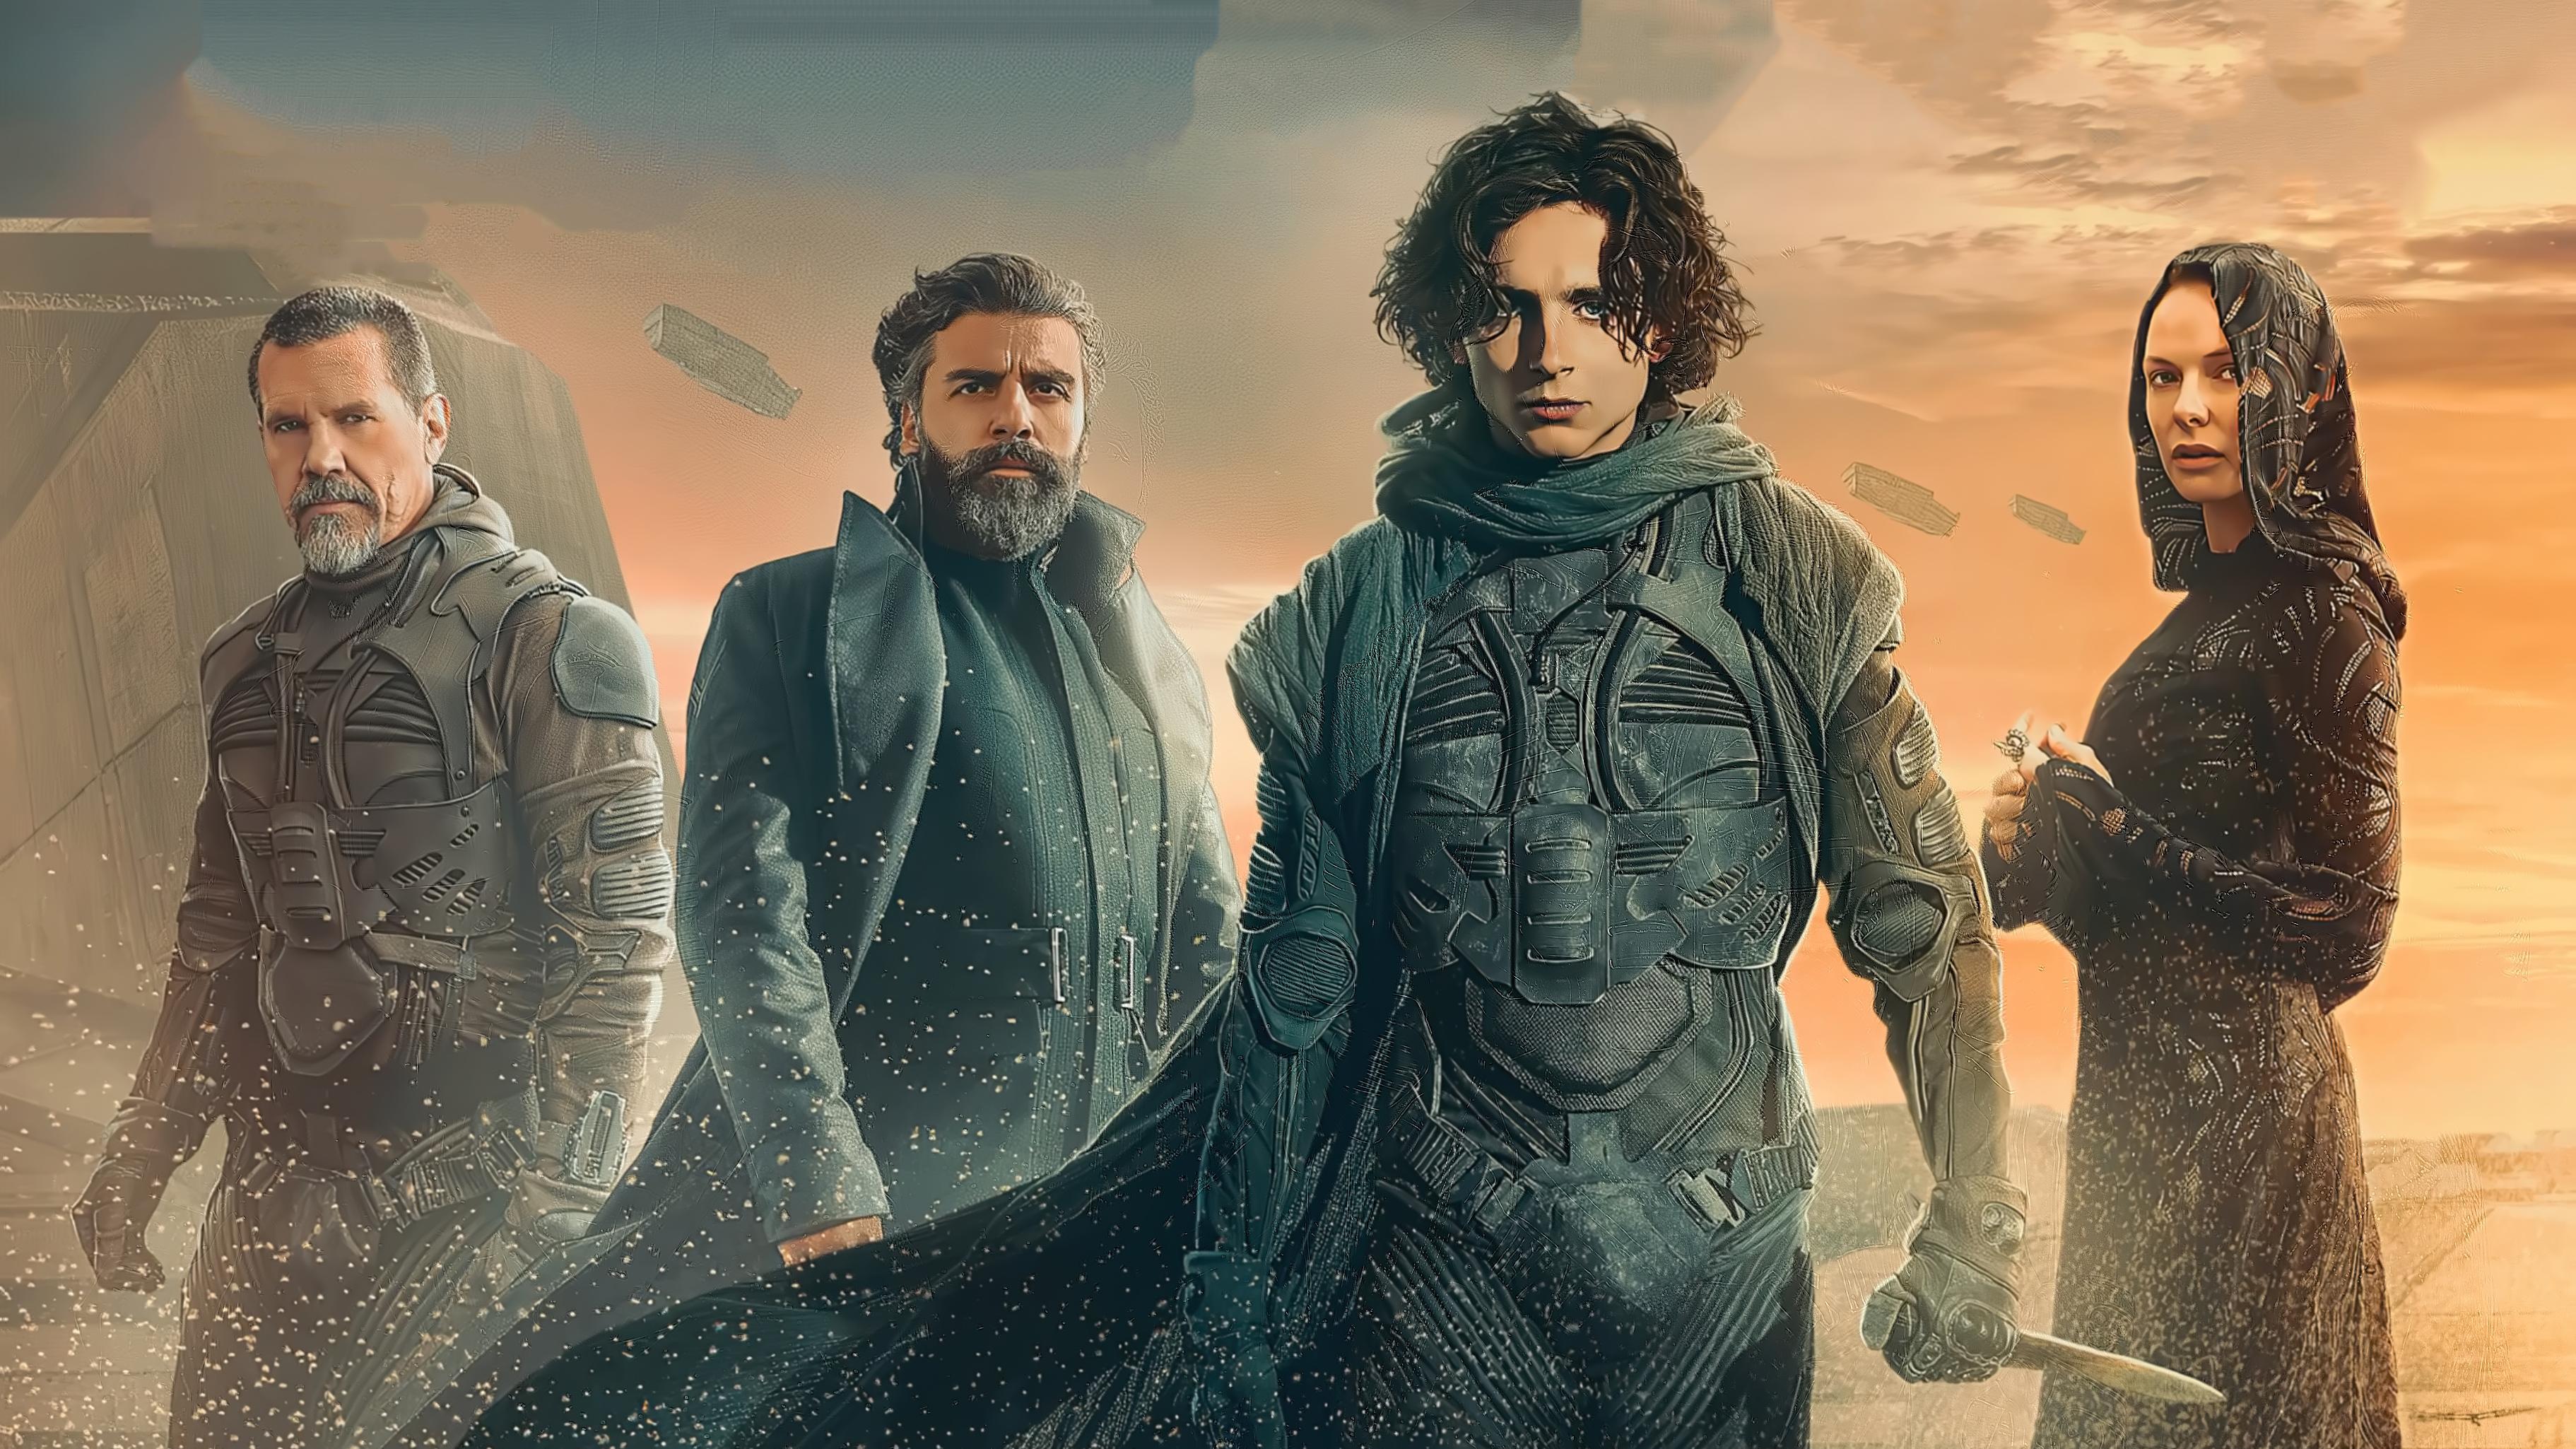 Dune 2020 Movie Josh Brolin Oscar Isaac Timothee Chalamet 3645x2050